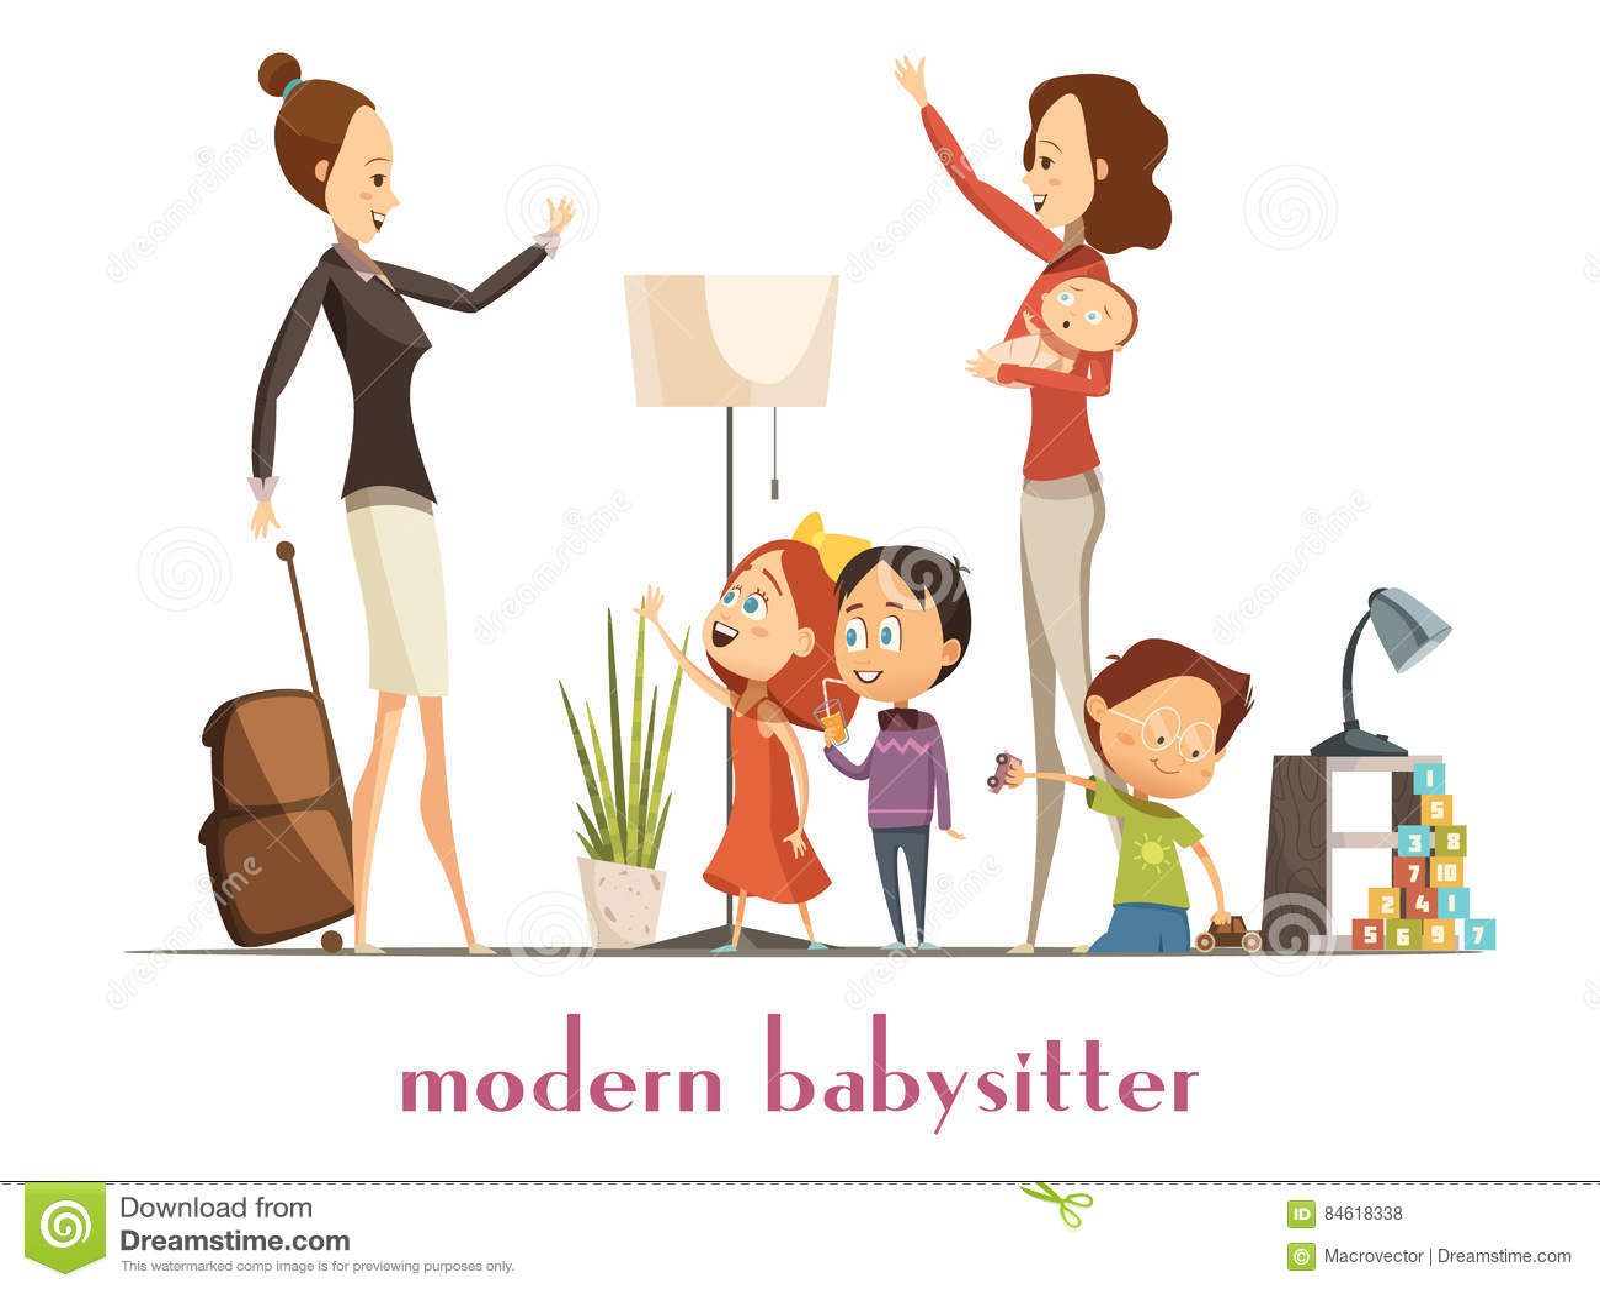 babysitter stock illustrations 934 babysitter stock illustrations rh dreamstime com baby sitting clipart babysitter clipart